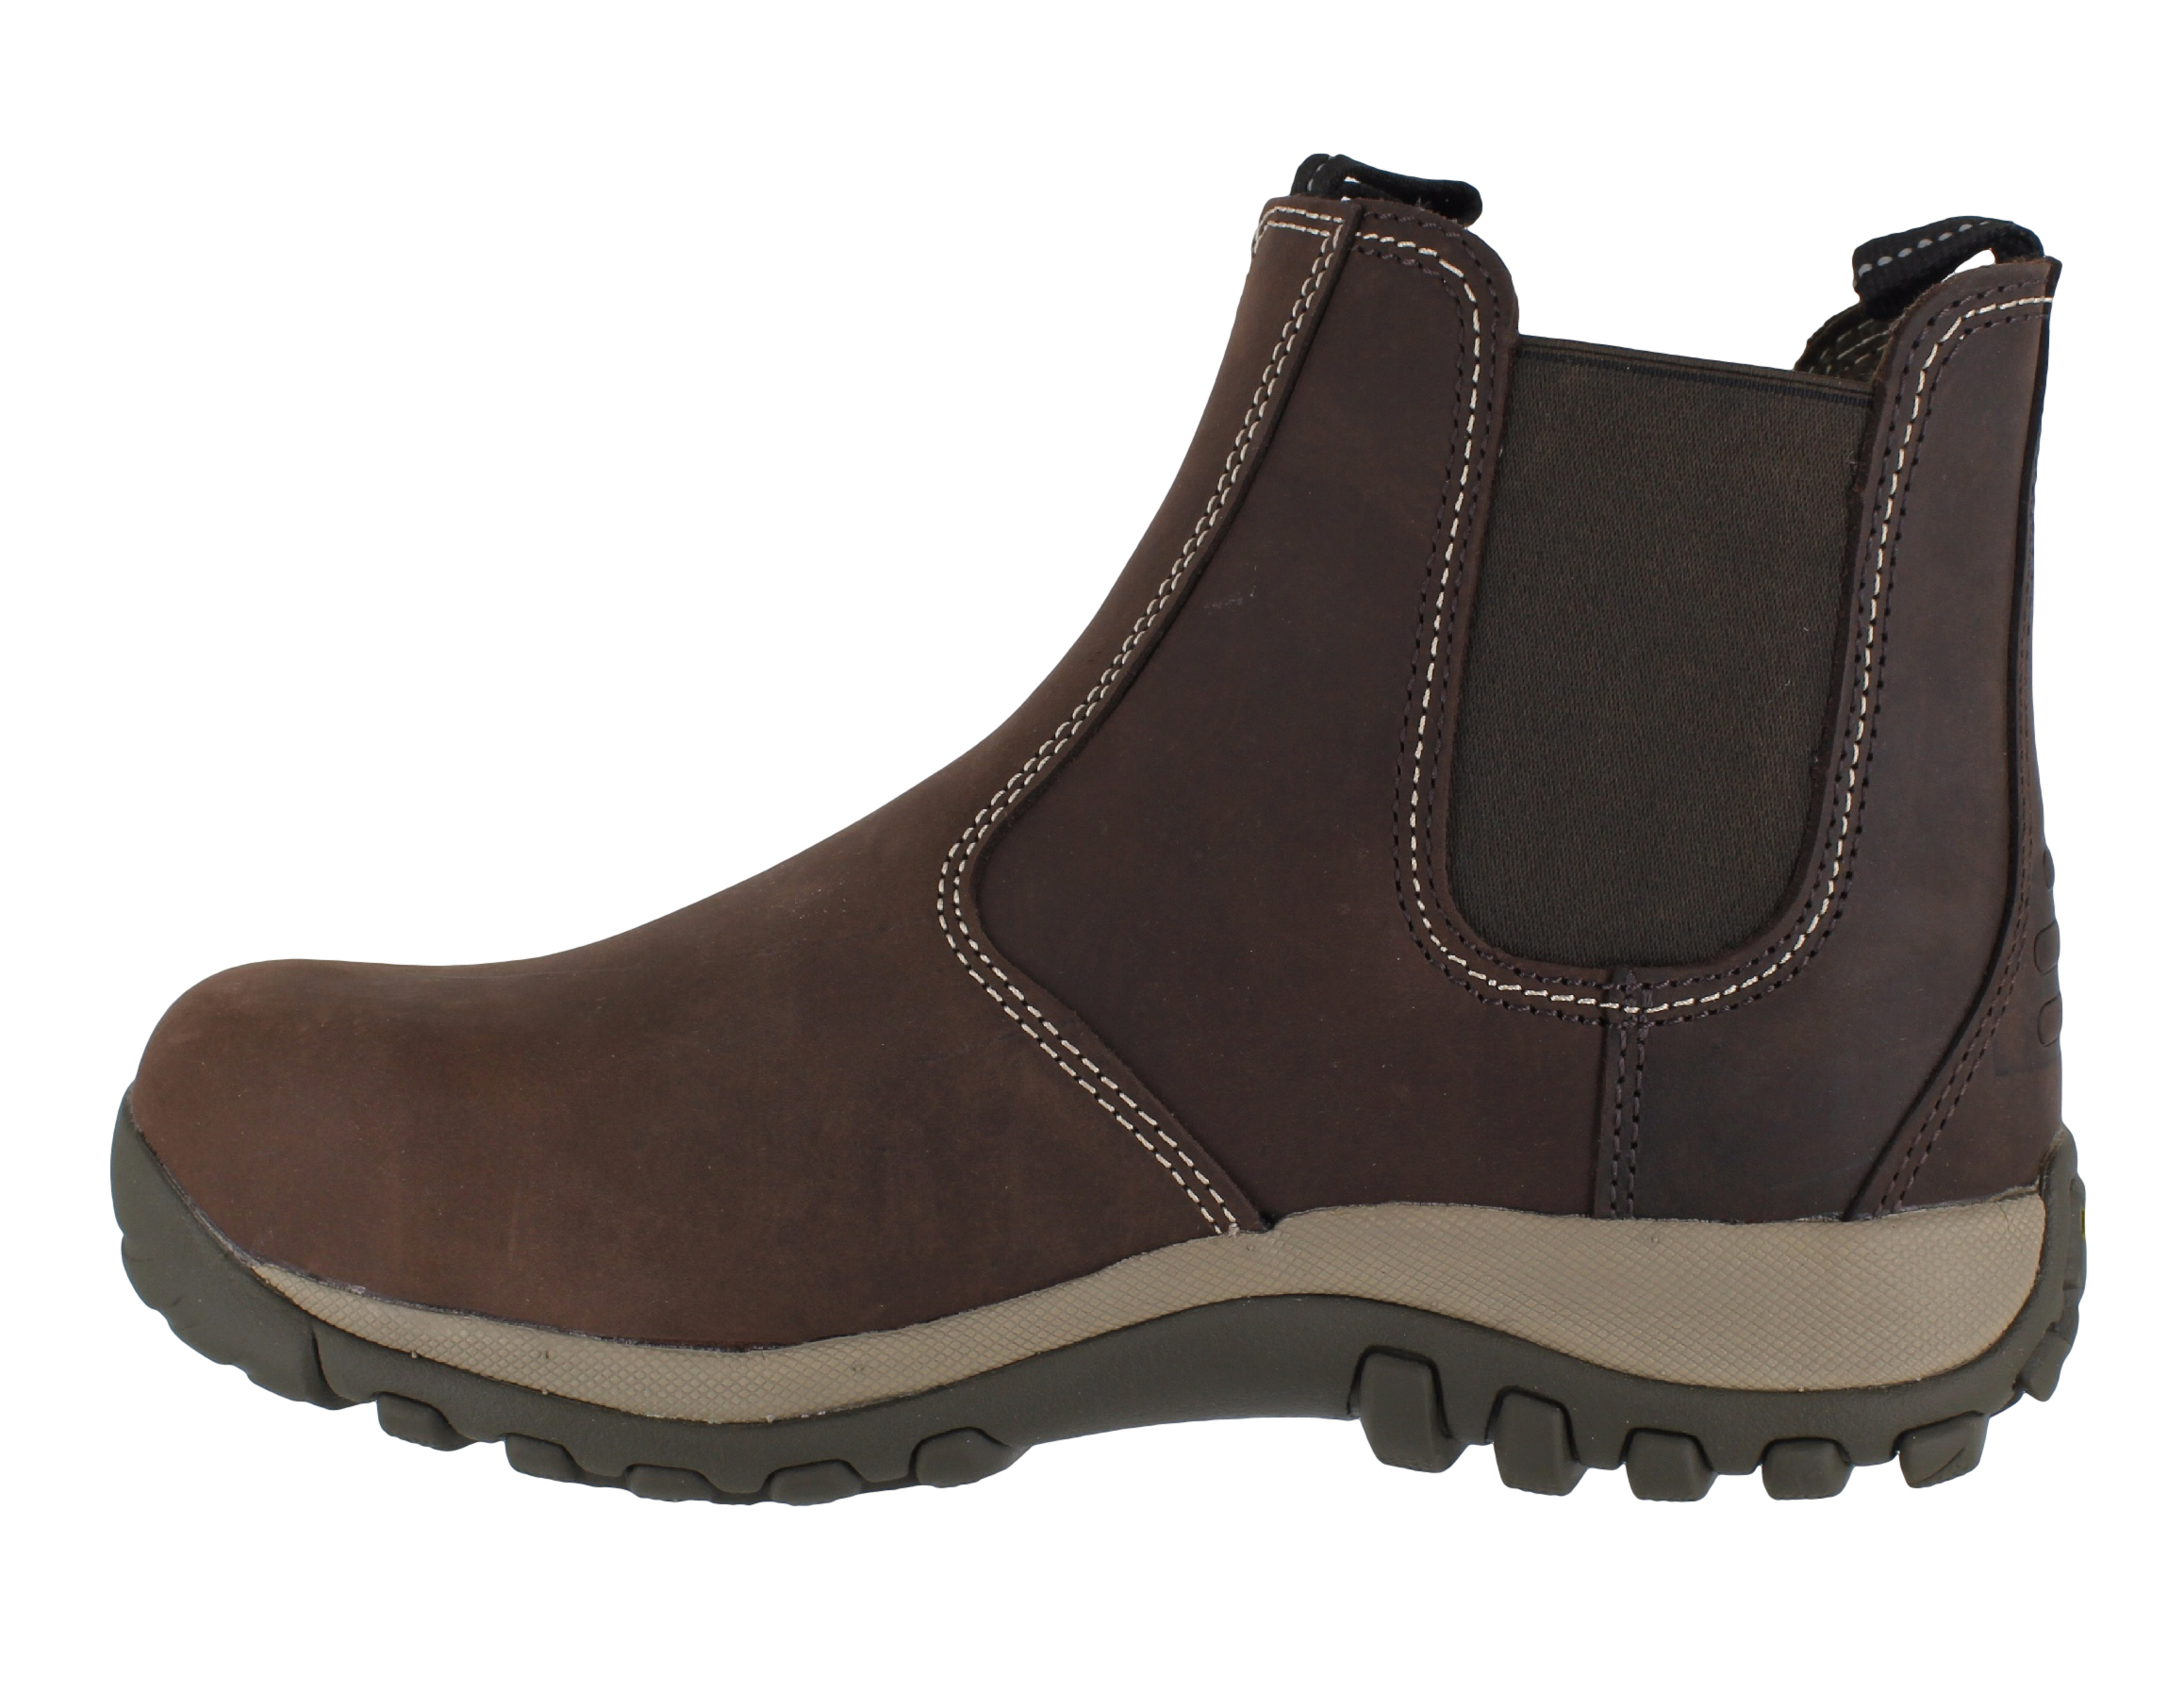 DeWalt Radial Waxy Brown Leather Steel Toe Cap Safety Work Dealer Chelsea Boots